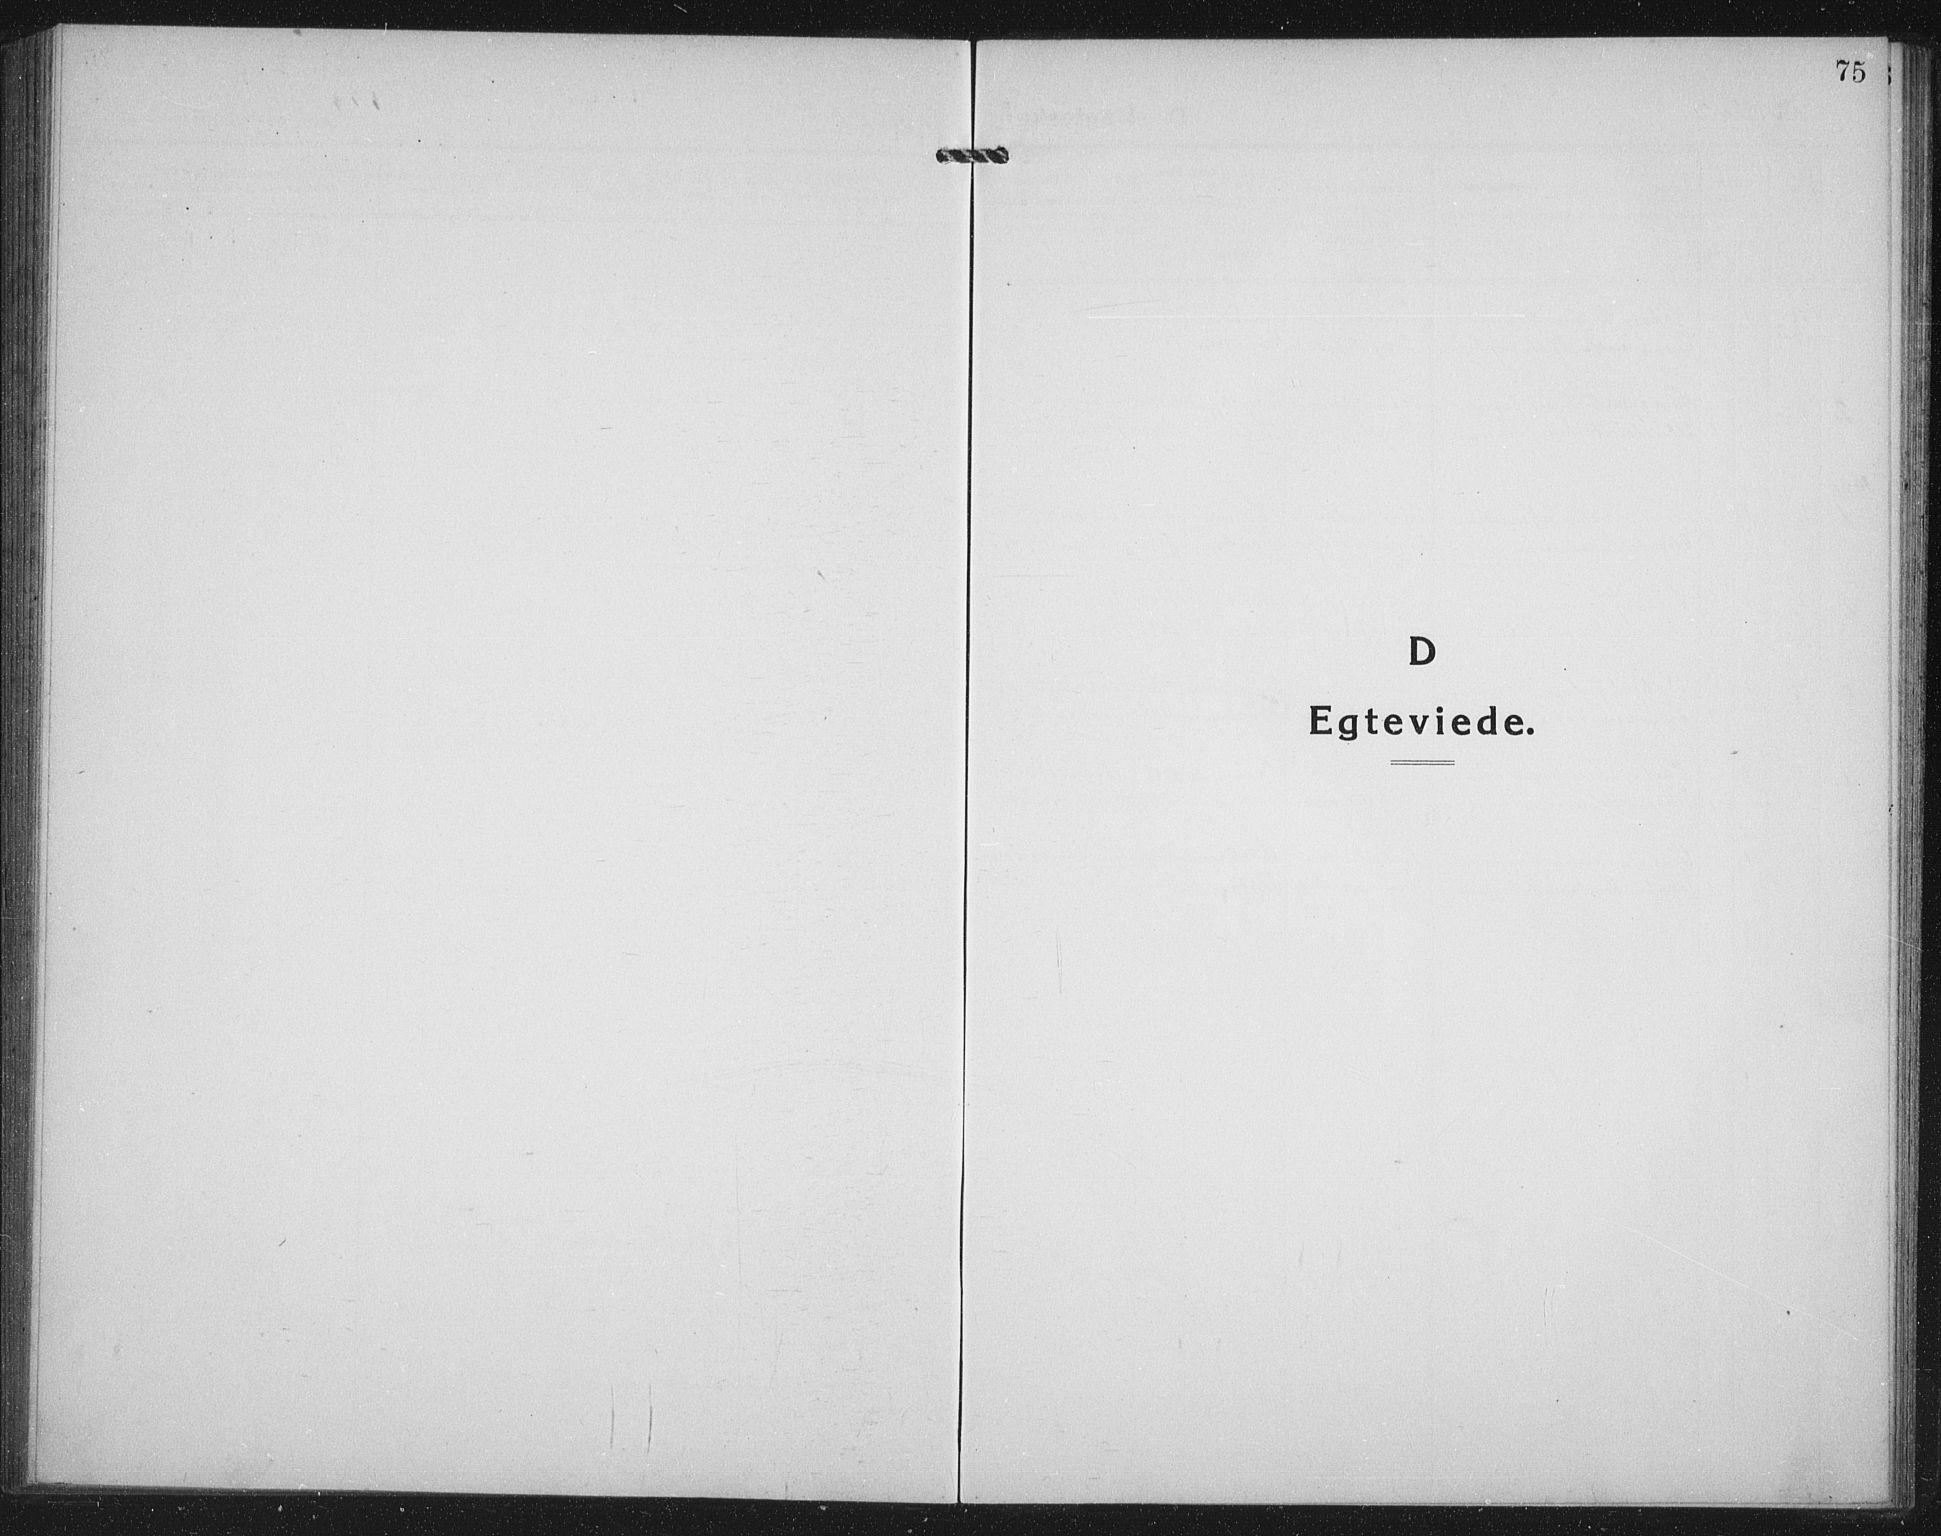 SATØ, Mefjord/Berg sokneprestkontor, G/Ga/Gab/L0014klokker: Klokkerbok nr. 14, 1922-1933, s. 75